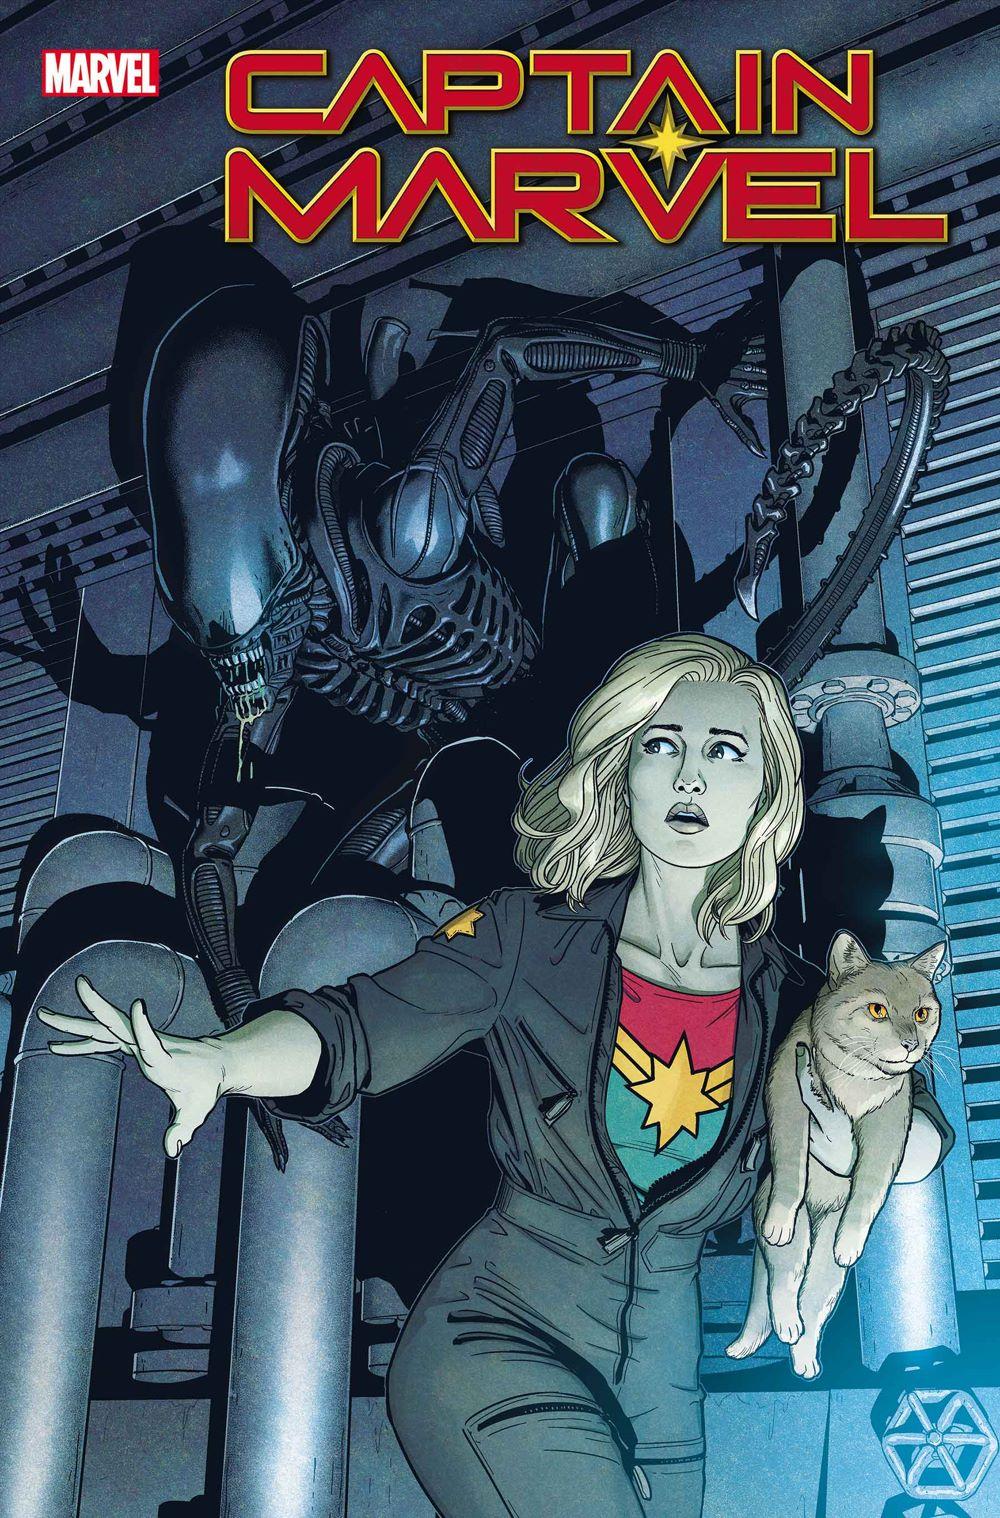 CAPMARV2019025_McKelvieVar Marvel Comics January 2021 Solicitations